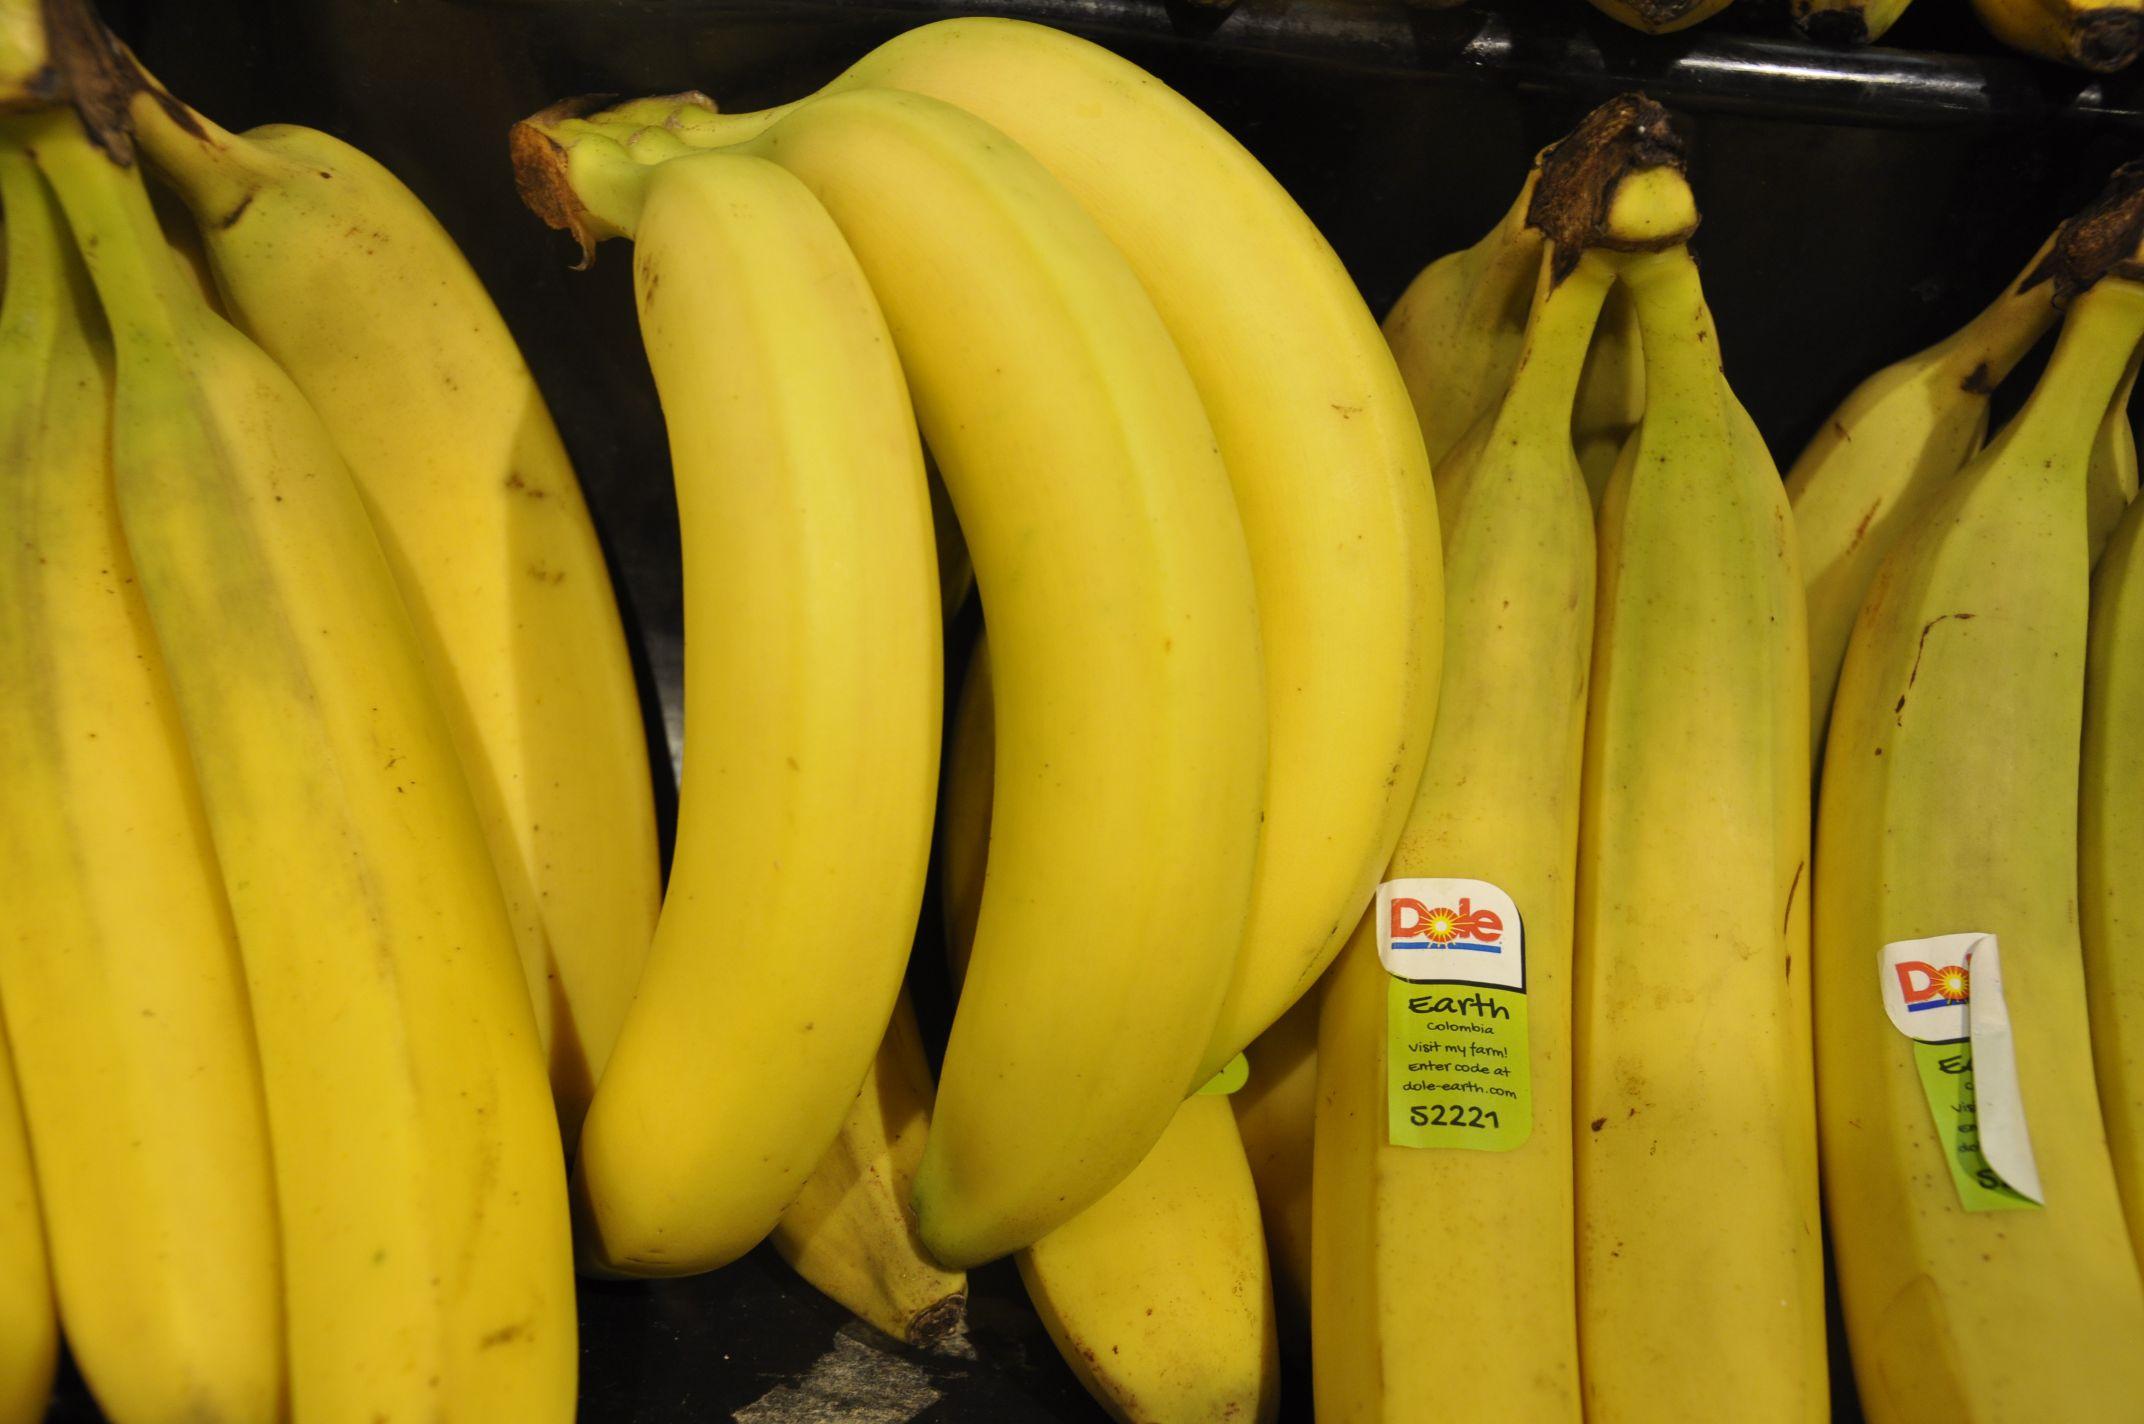 banane kohlenhydrate banane fruchtzucker kalorien kalorien guru. Black Bedroom Furniture Sets. Home Design Ideas